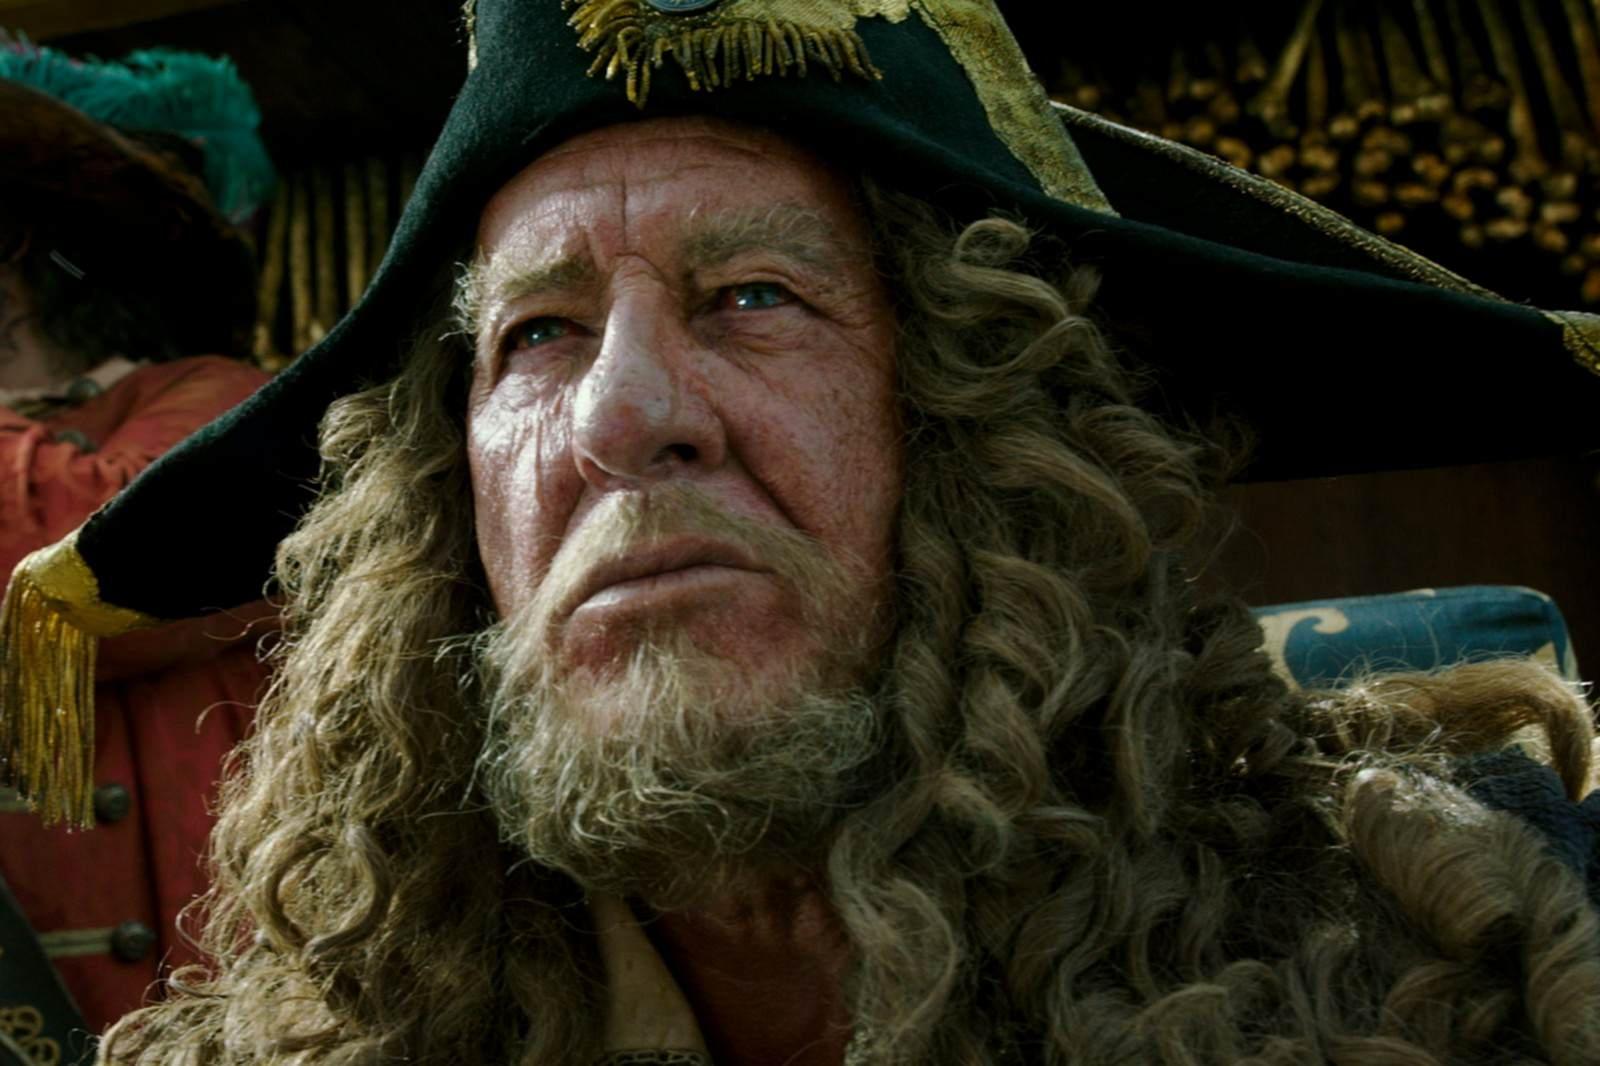 Movie, Pirates of the Caribbean: Dead Men Tell No Tales(美國, 2017年) / 加勒比海盜 神鬼奇航:死無對證(台灣) / 加勒比海盗5:死无对证(中國) / 加勒比海盜:惡靈啟航(香港), 電影角色與演員介紹